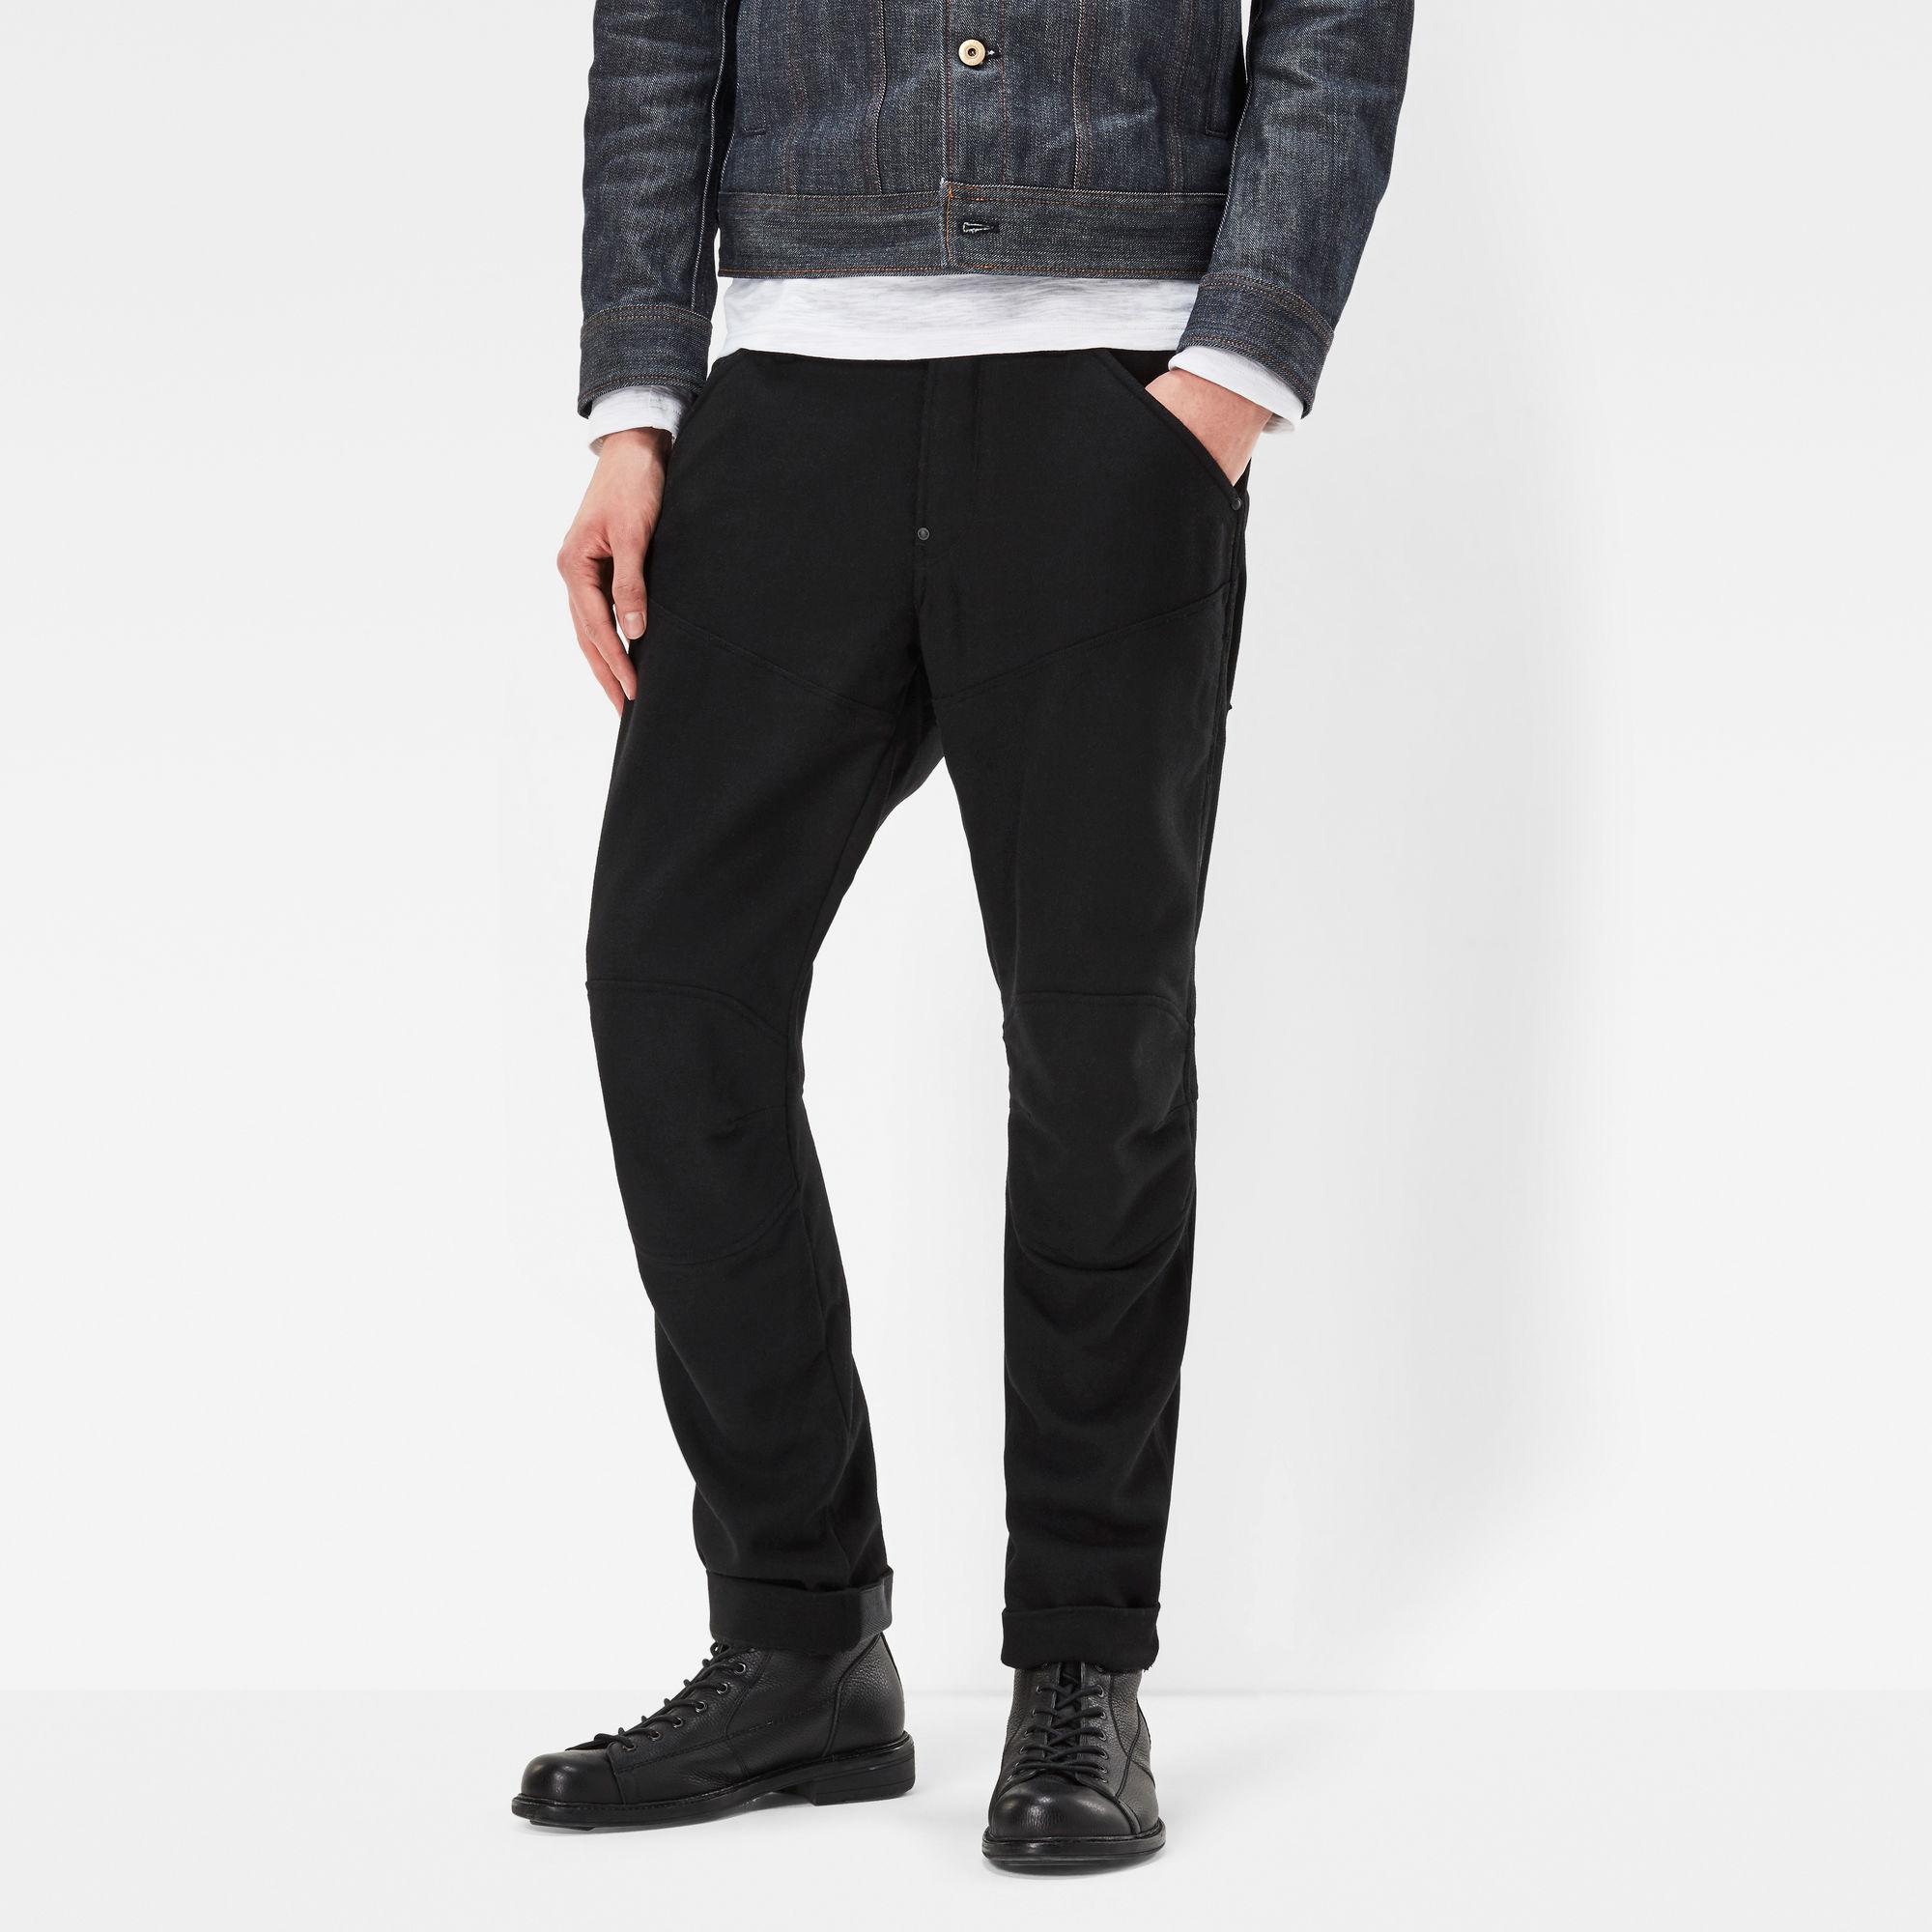 5620 G-Star Elwood Wool 3D Tapered Pants